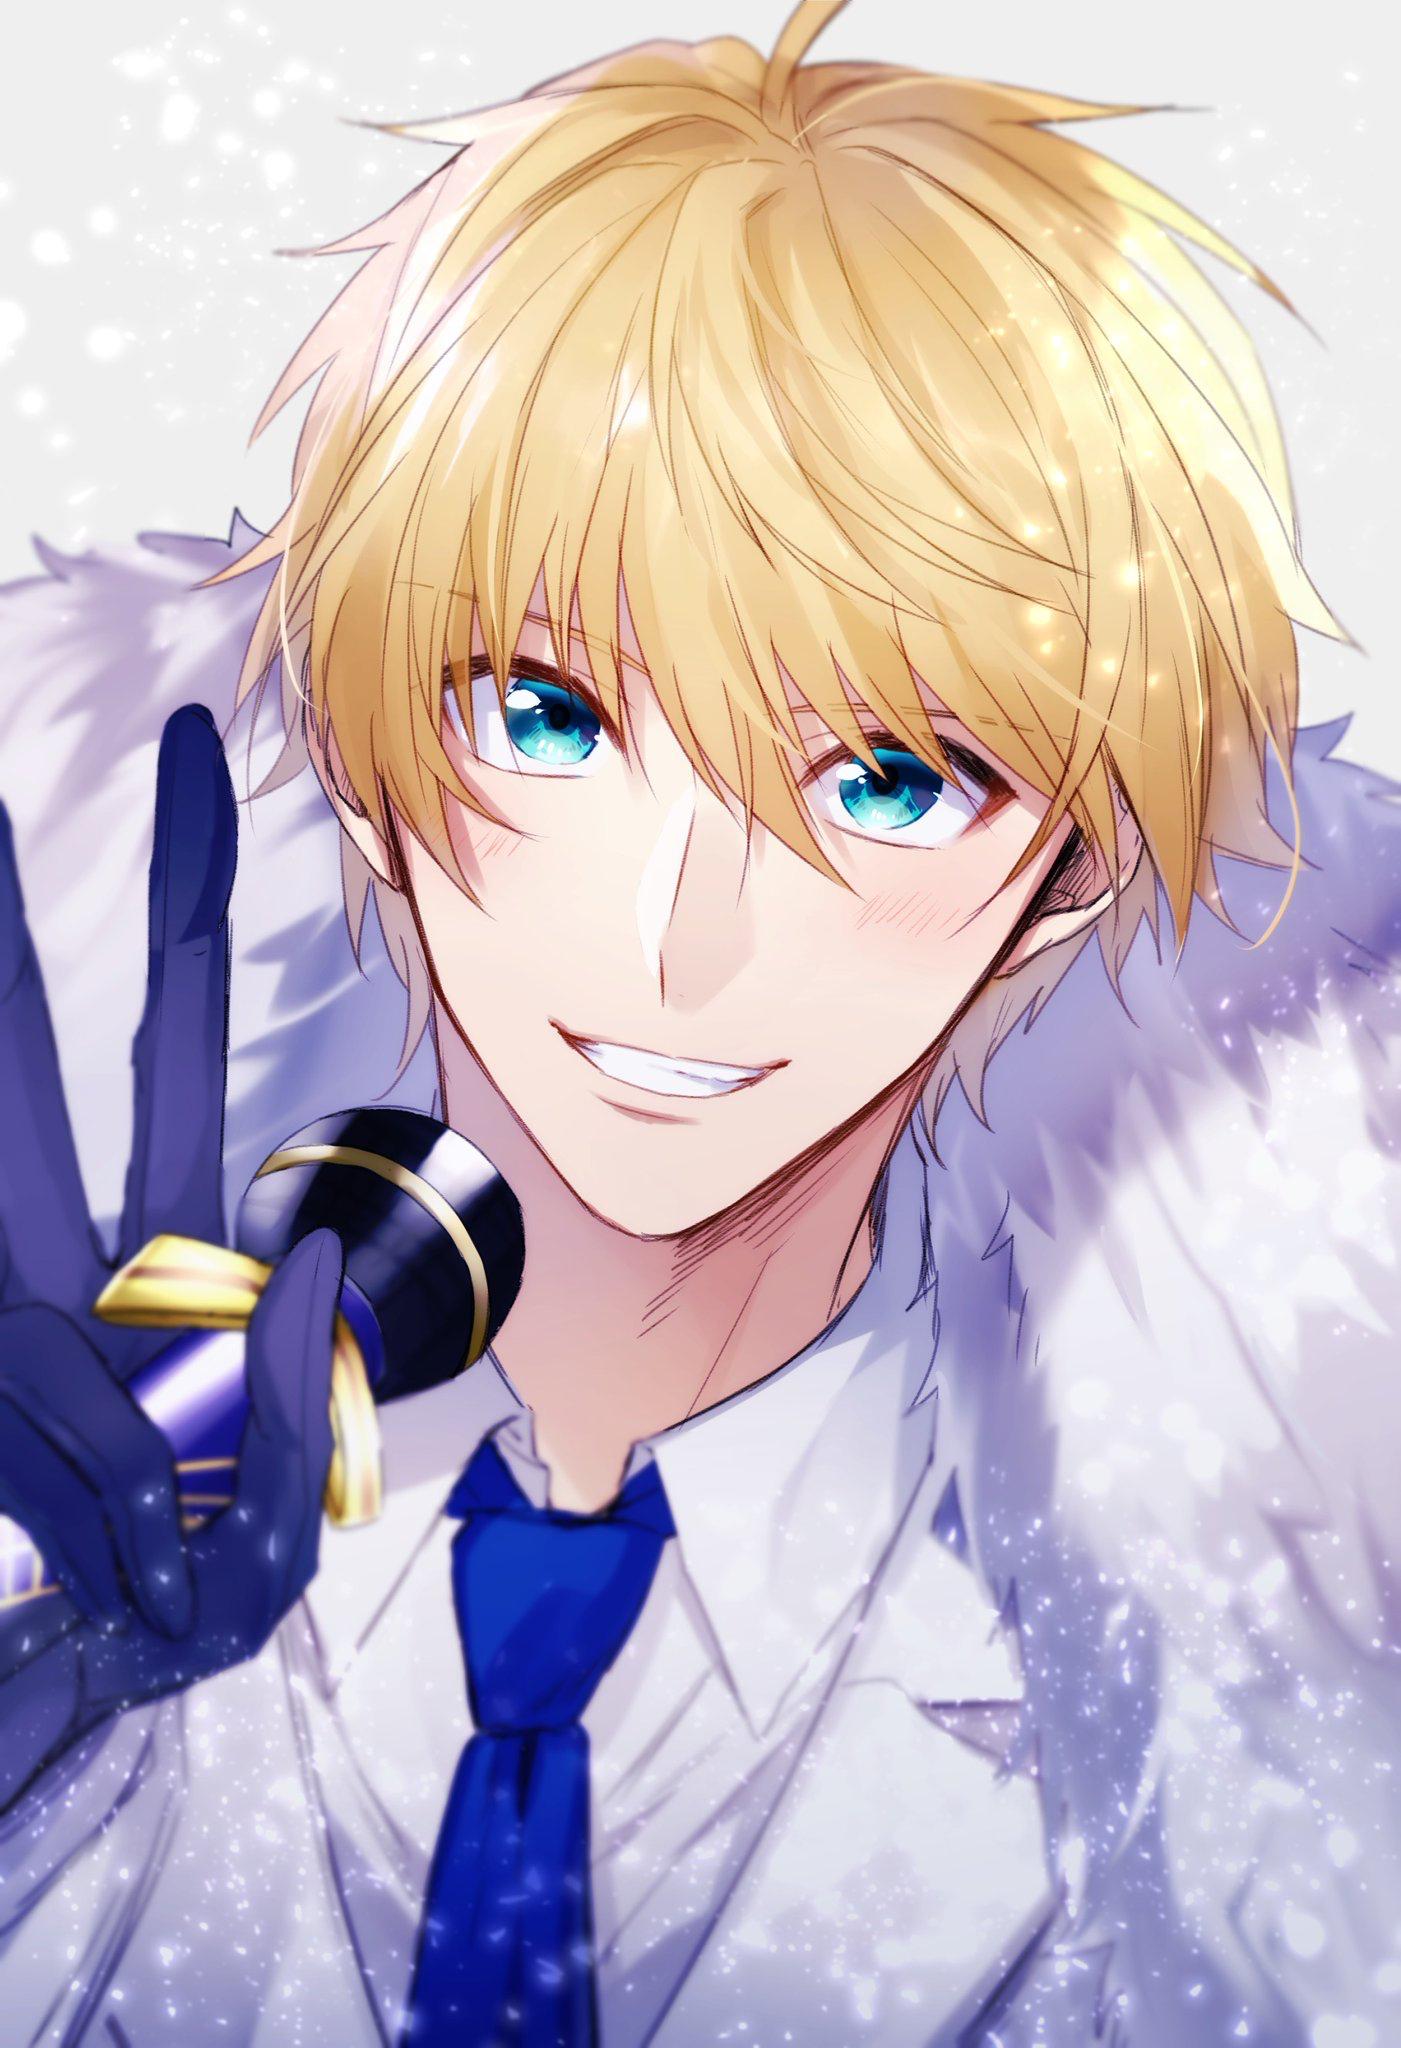 Beautiful Anime Boys 7animenet Fate2019 アニメボーイズ